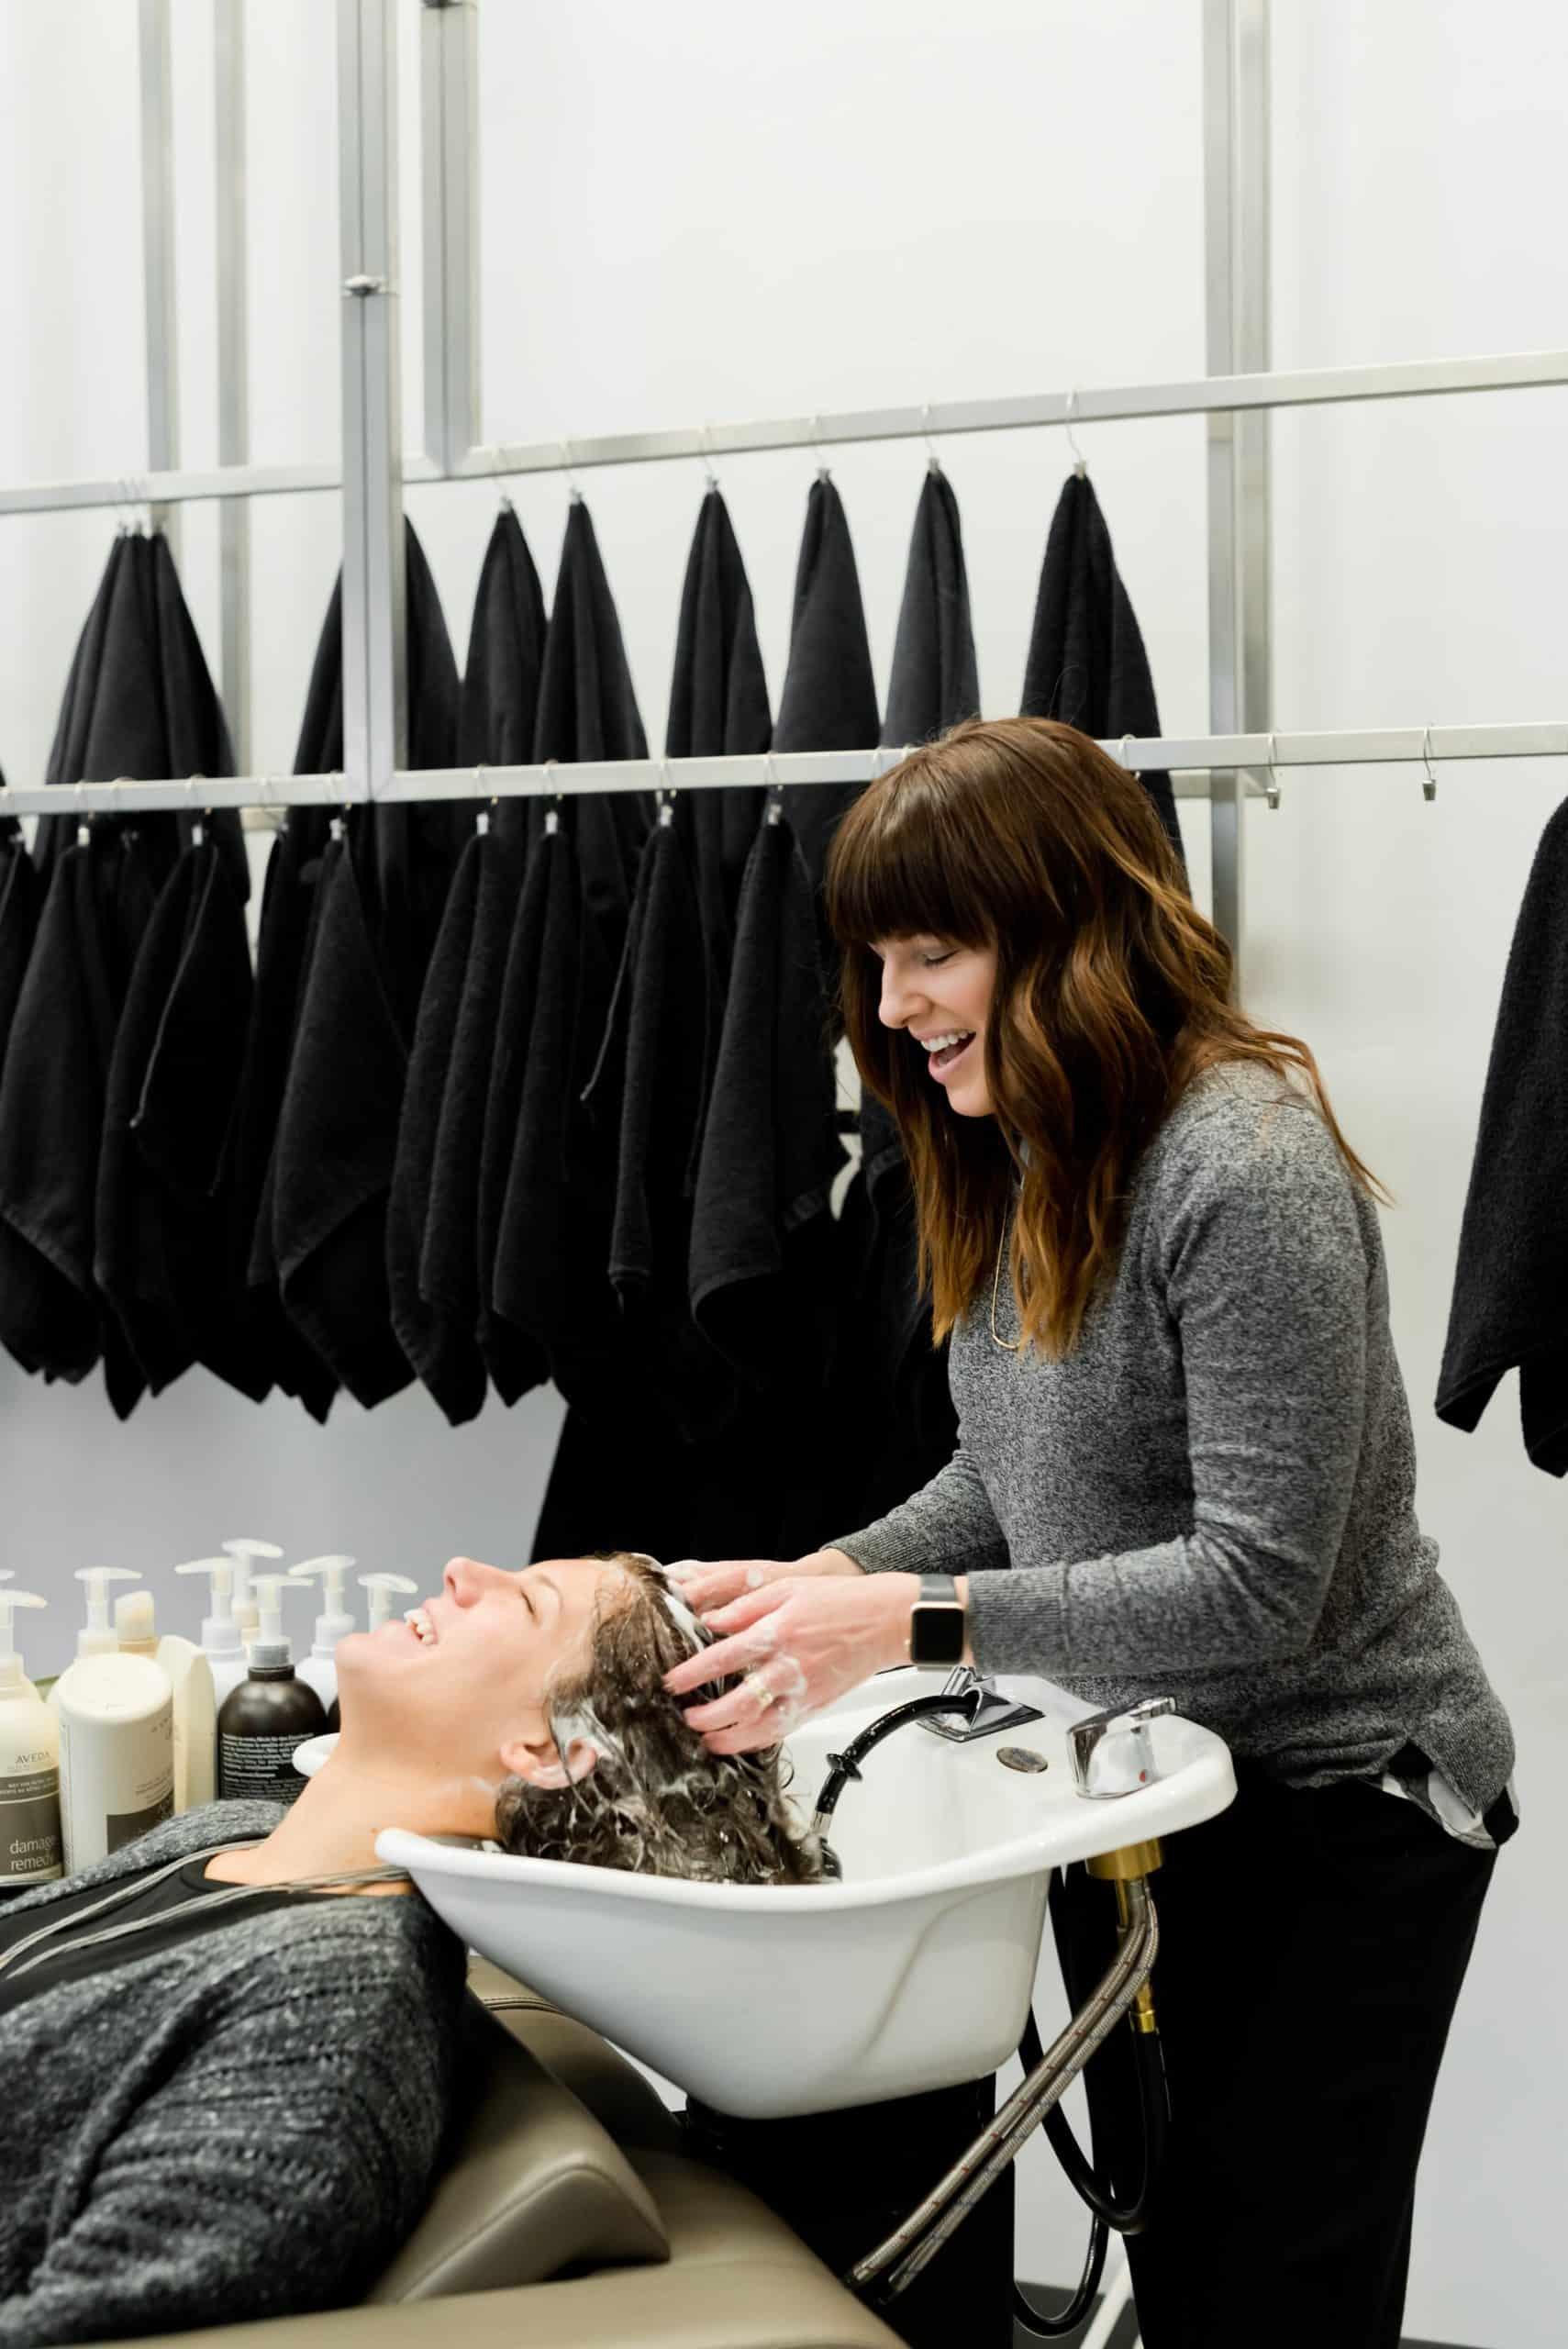 Top Haircare Tips Secrets Salon Article Image